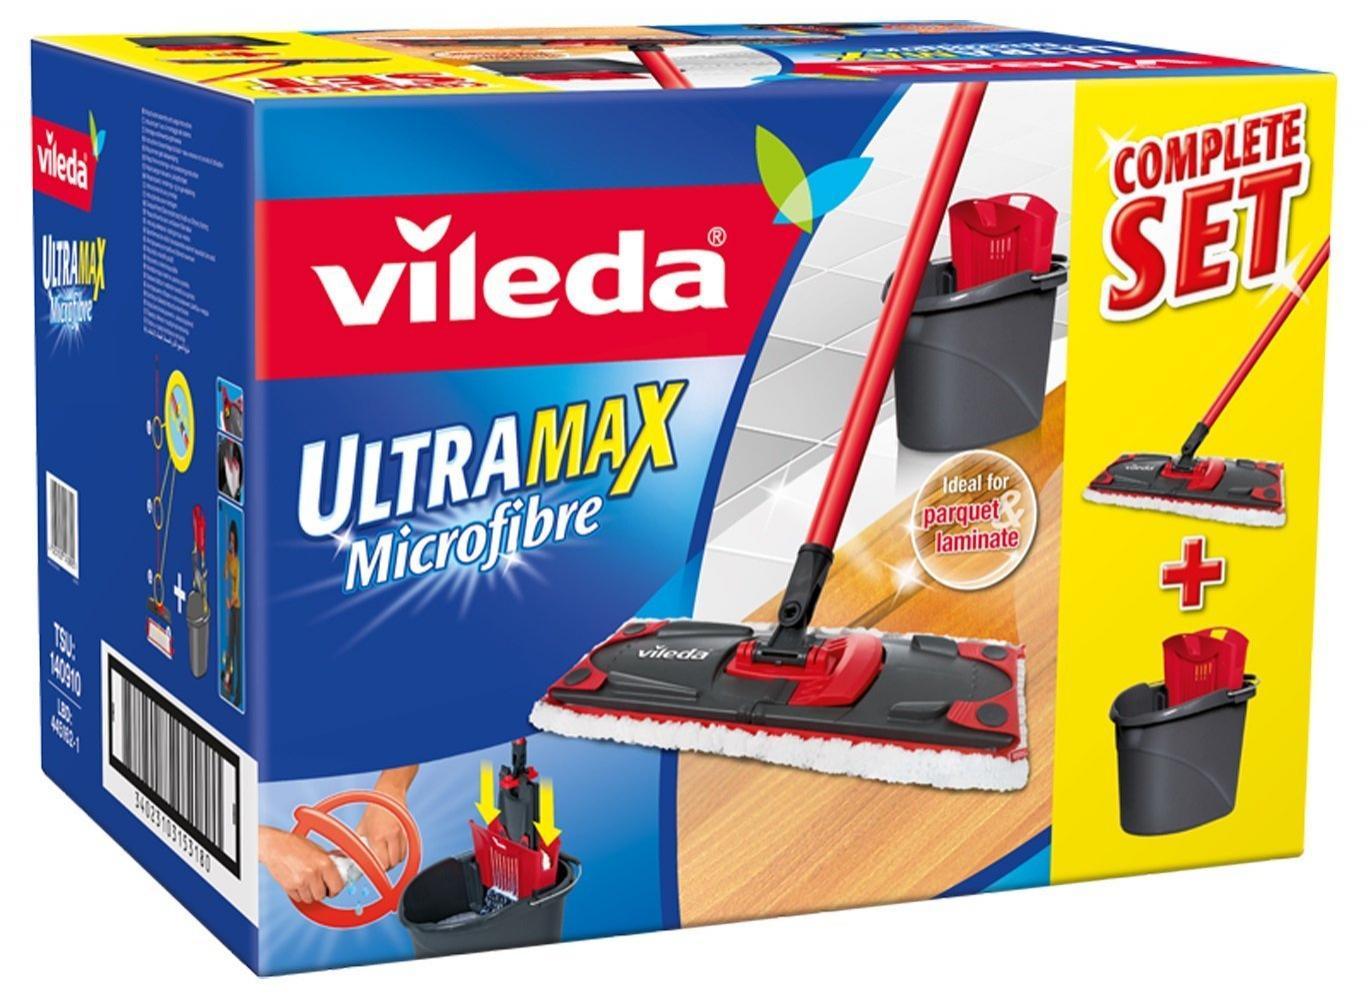 [Premium] Set Balai à Plat + Seau-Essoreur Vileda - 137431 - Ultra Max complète